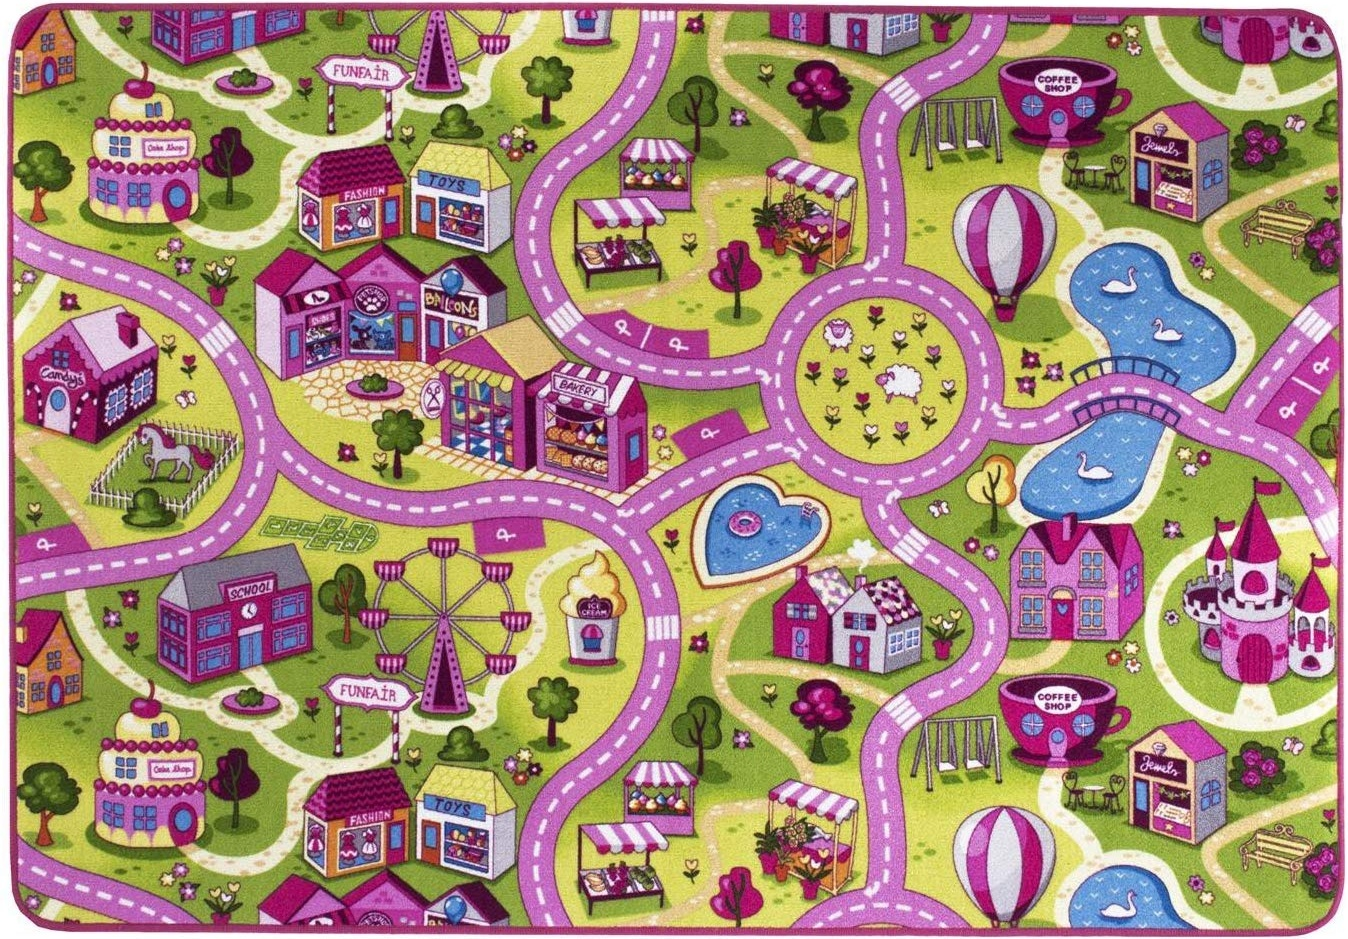 Kinderteppich 'City' 95x200 cm Bild 1